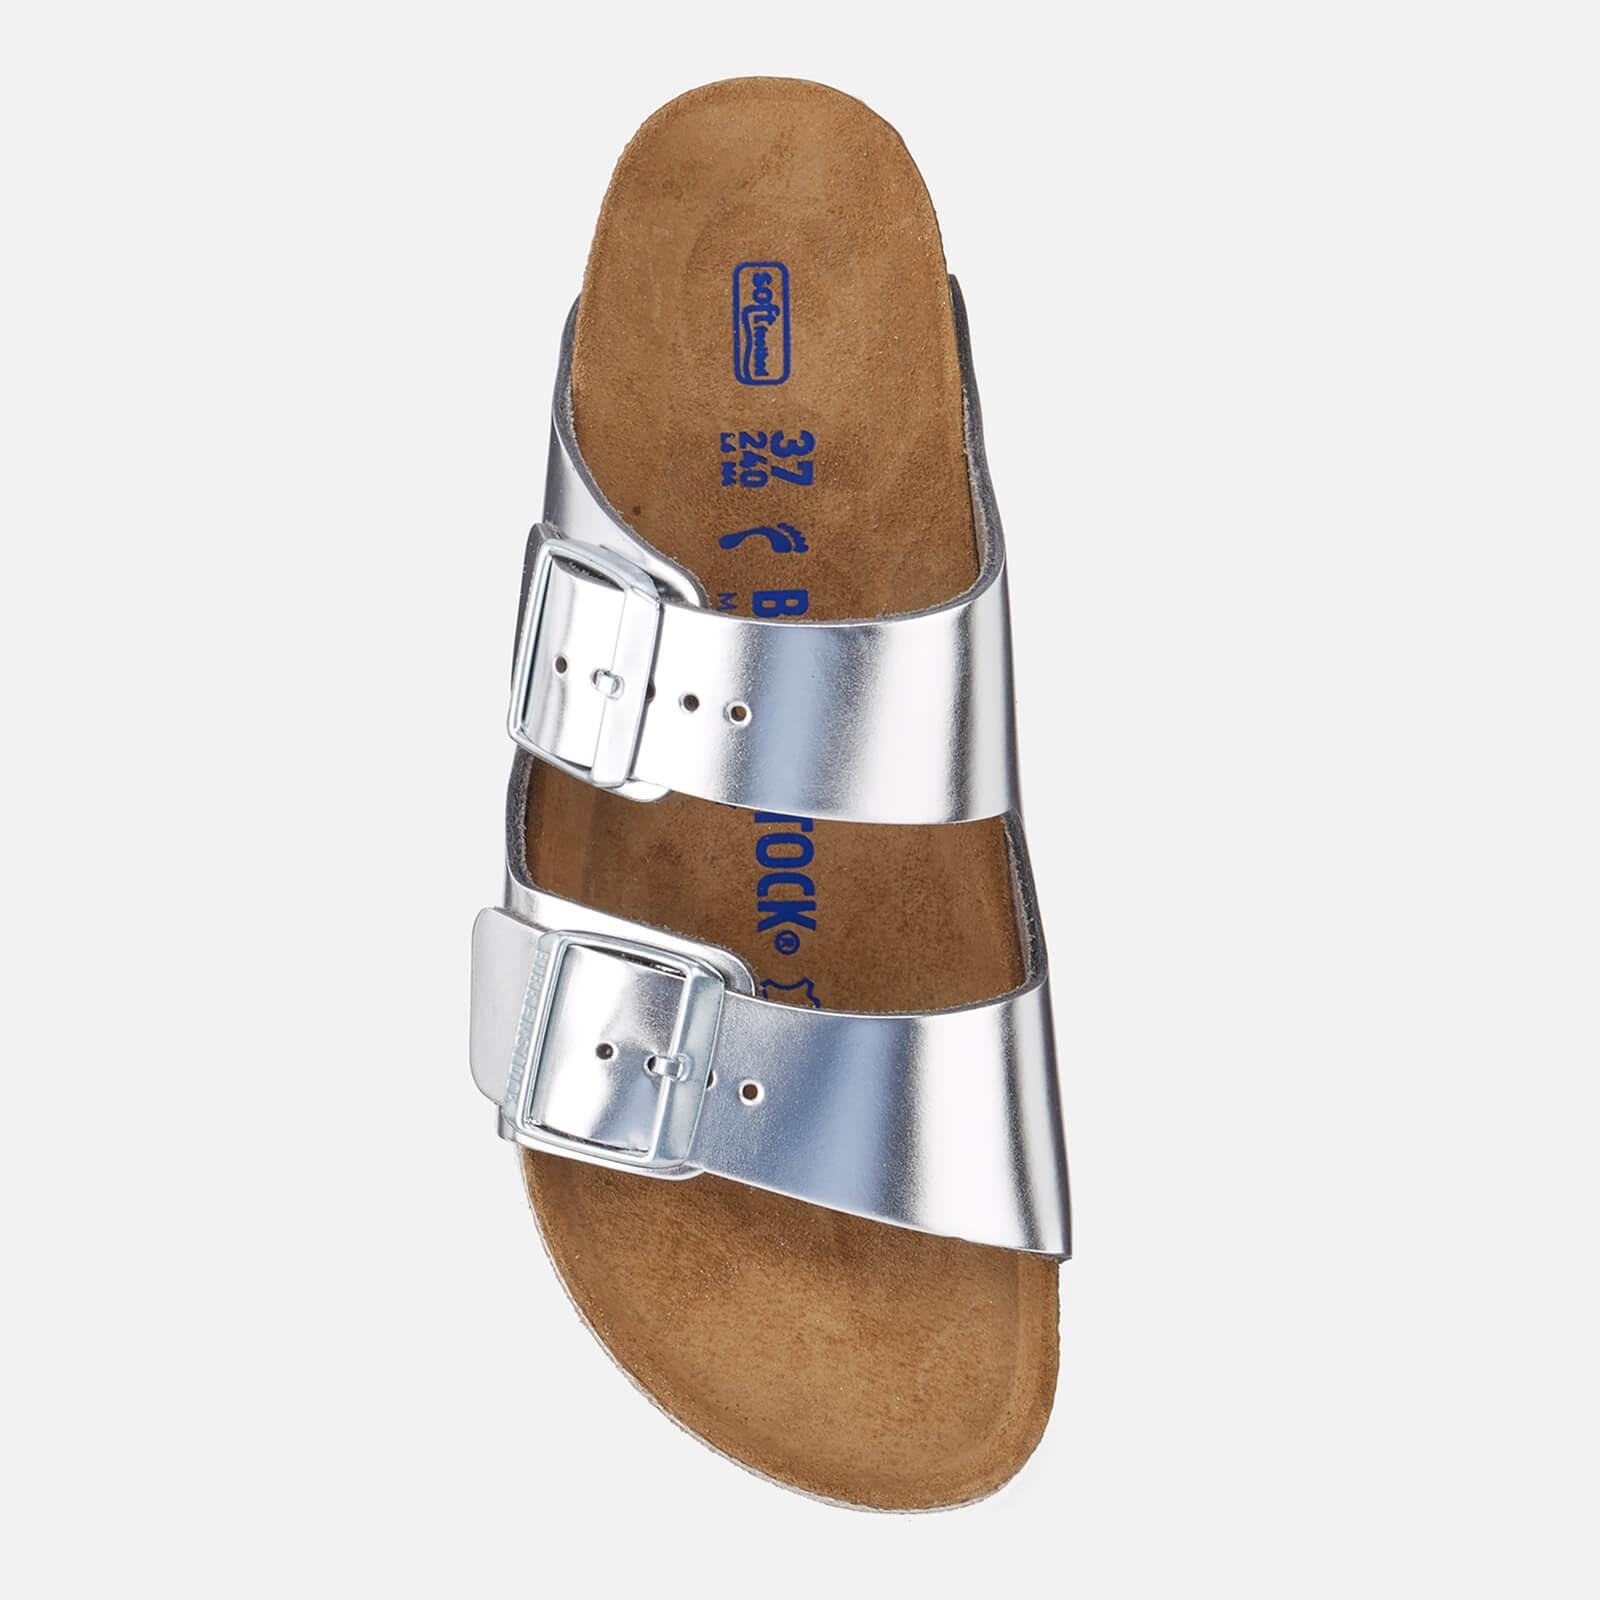 5c6eb032d2b Lyst - Birkenstock Arizona Slim Fit Leather Double Strap Sandals in ...